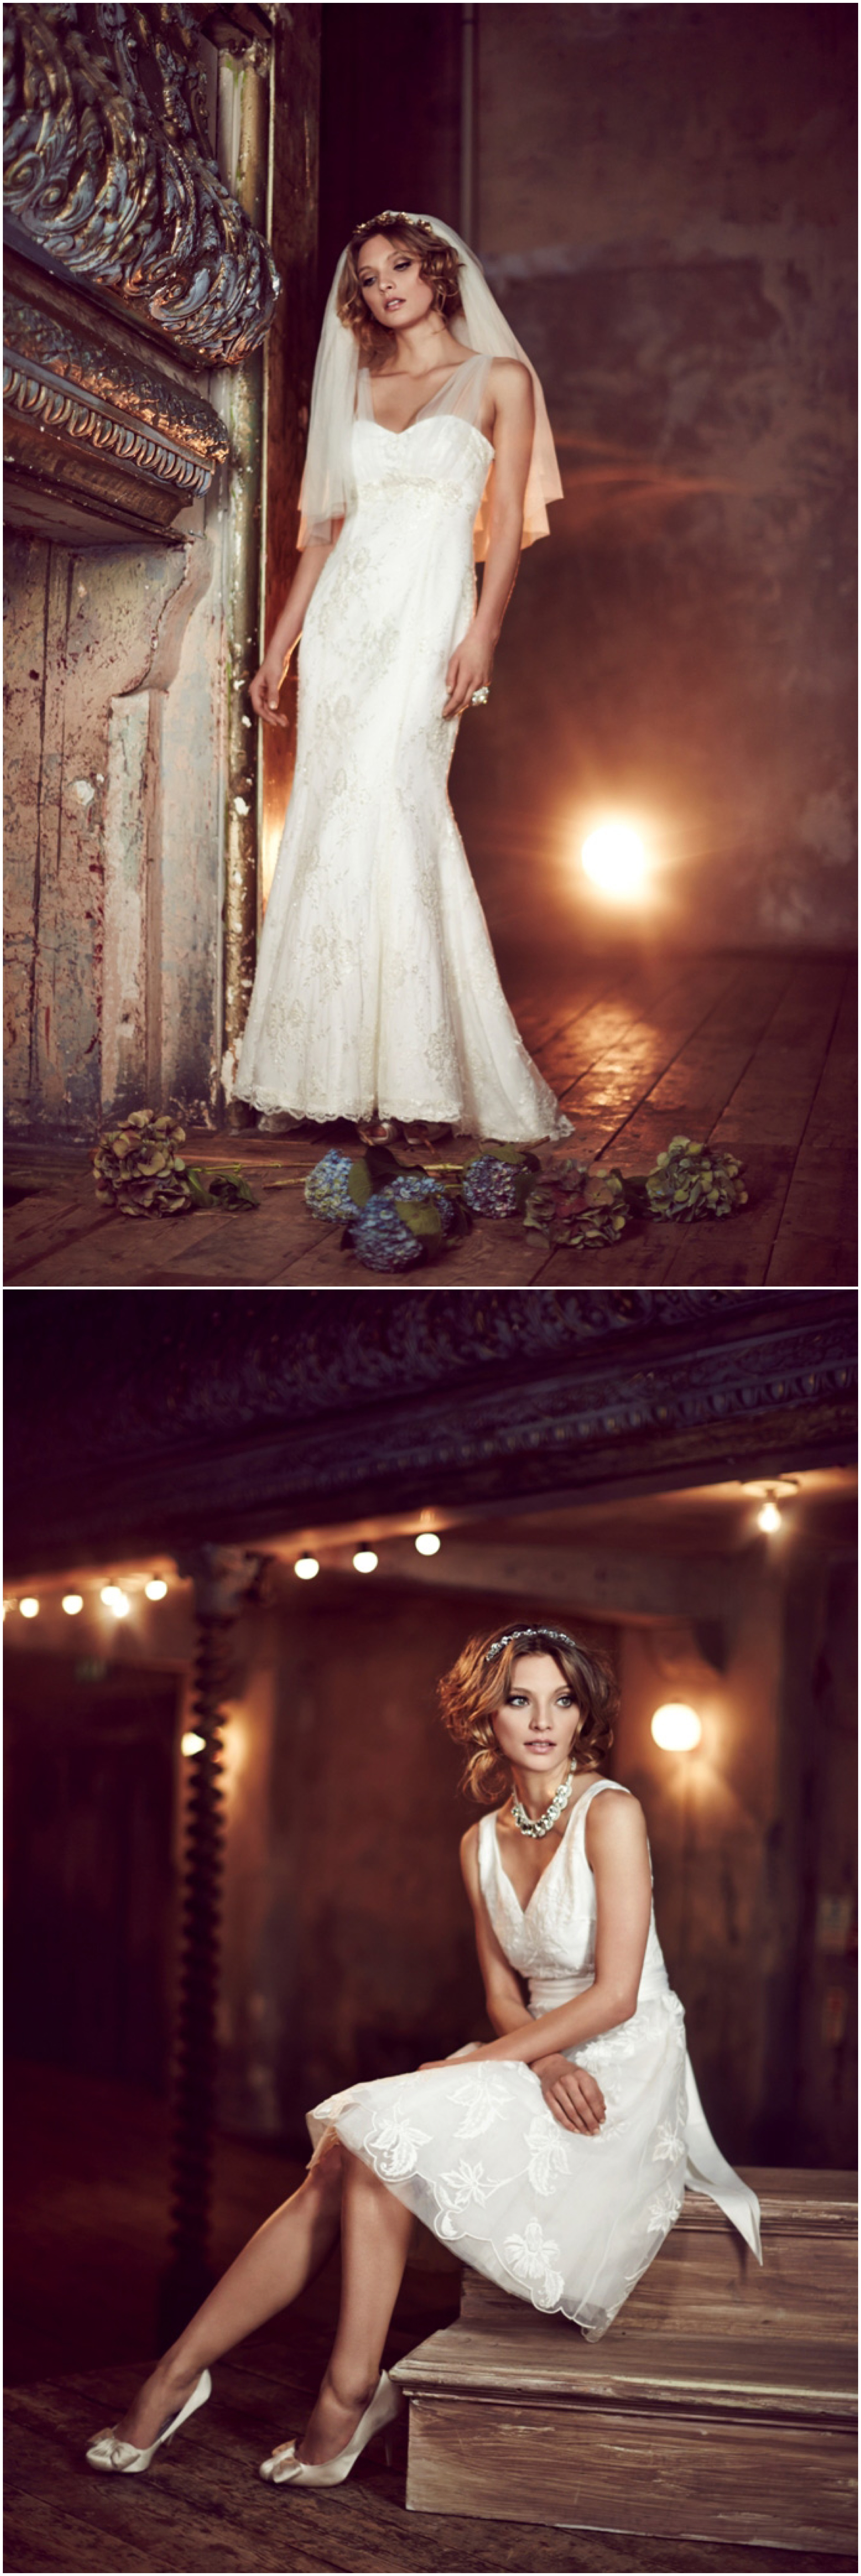 Wedding Inspiration: Dress Inspiration 2014